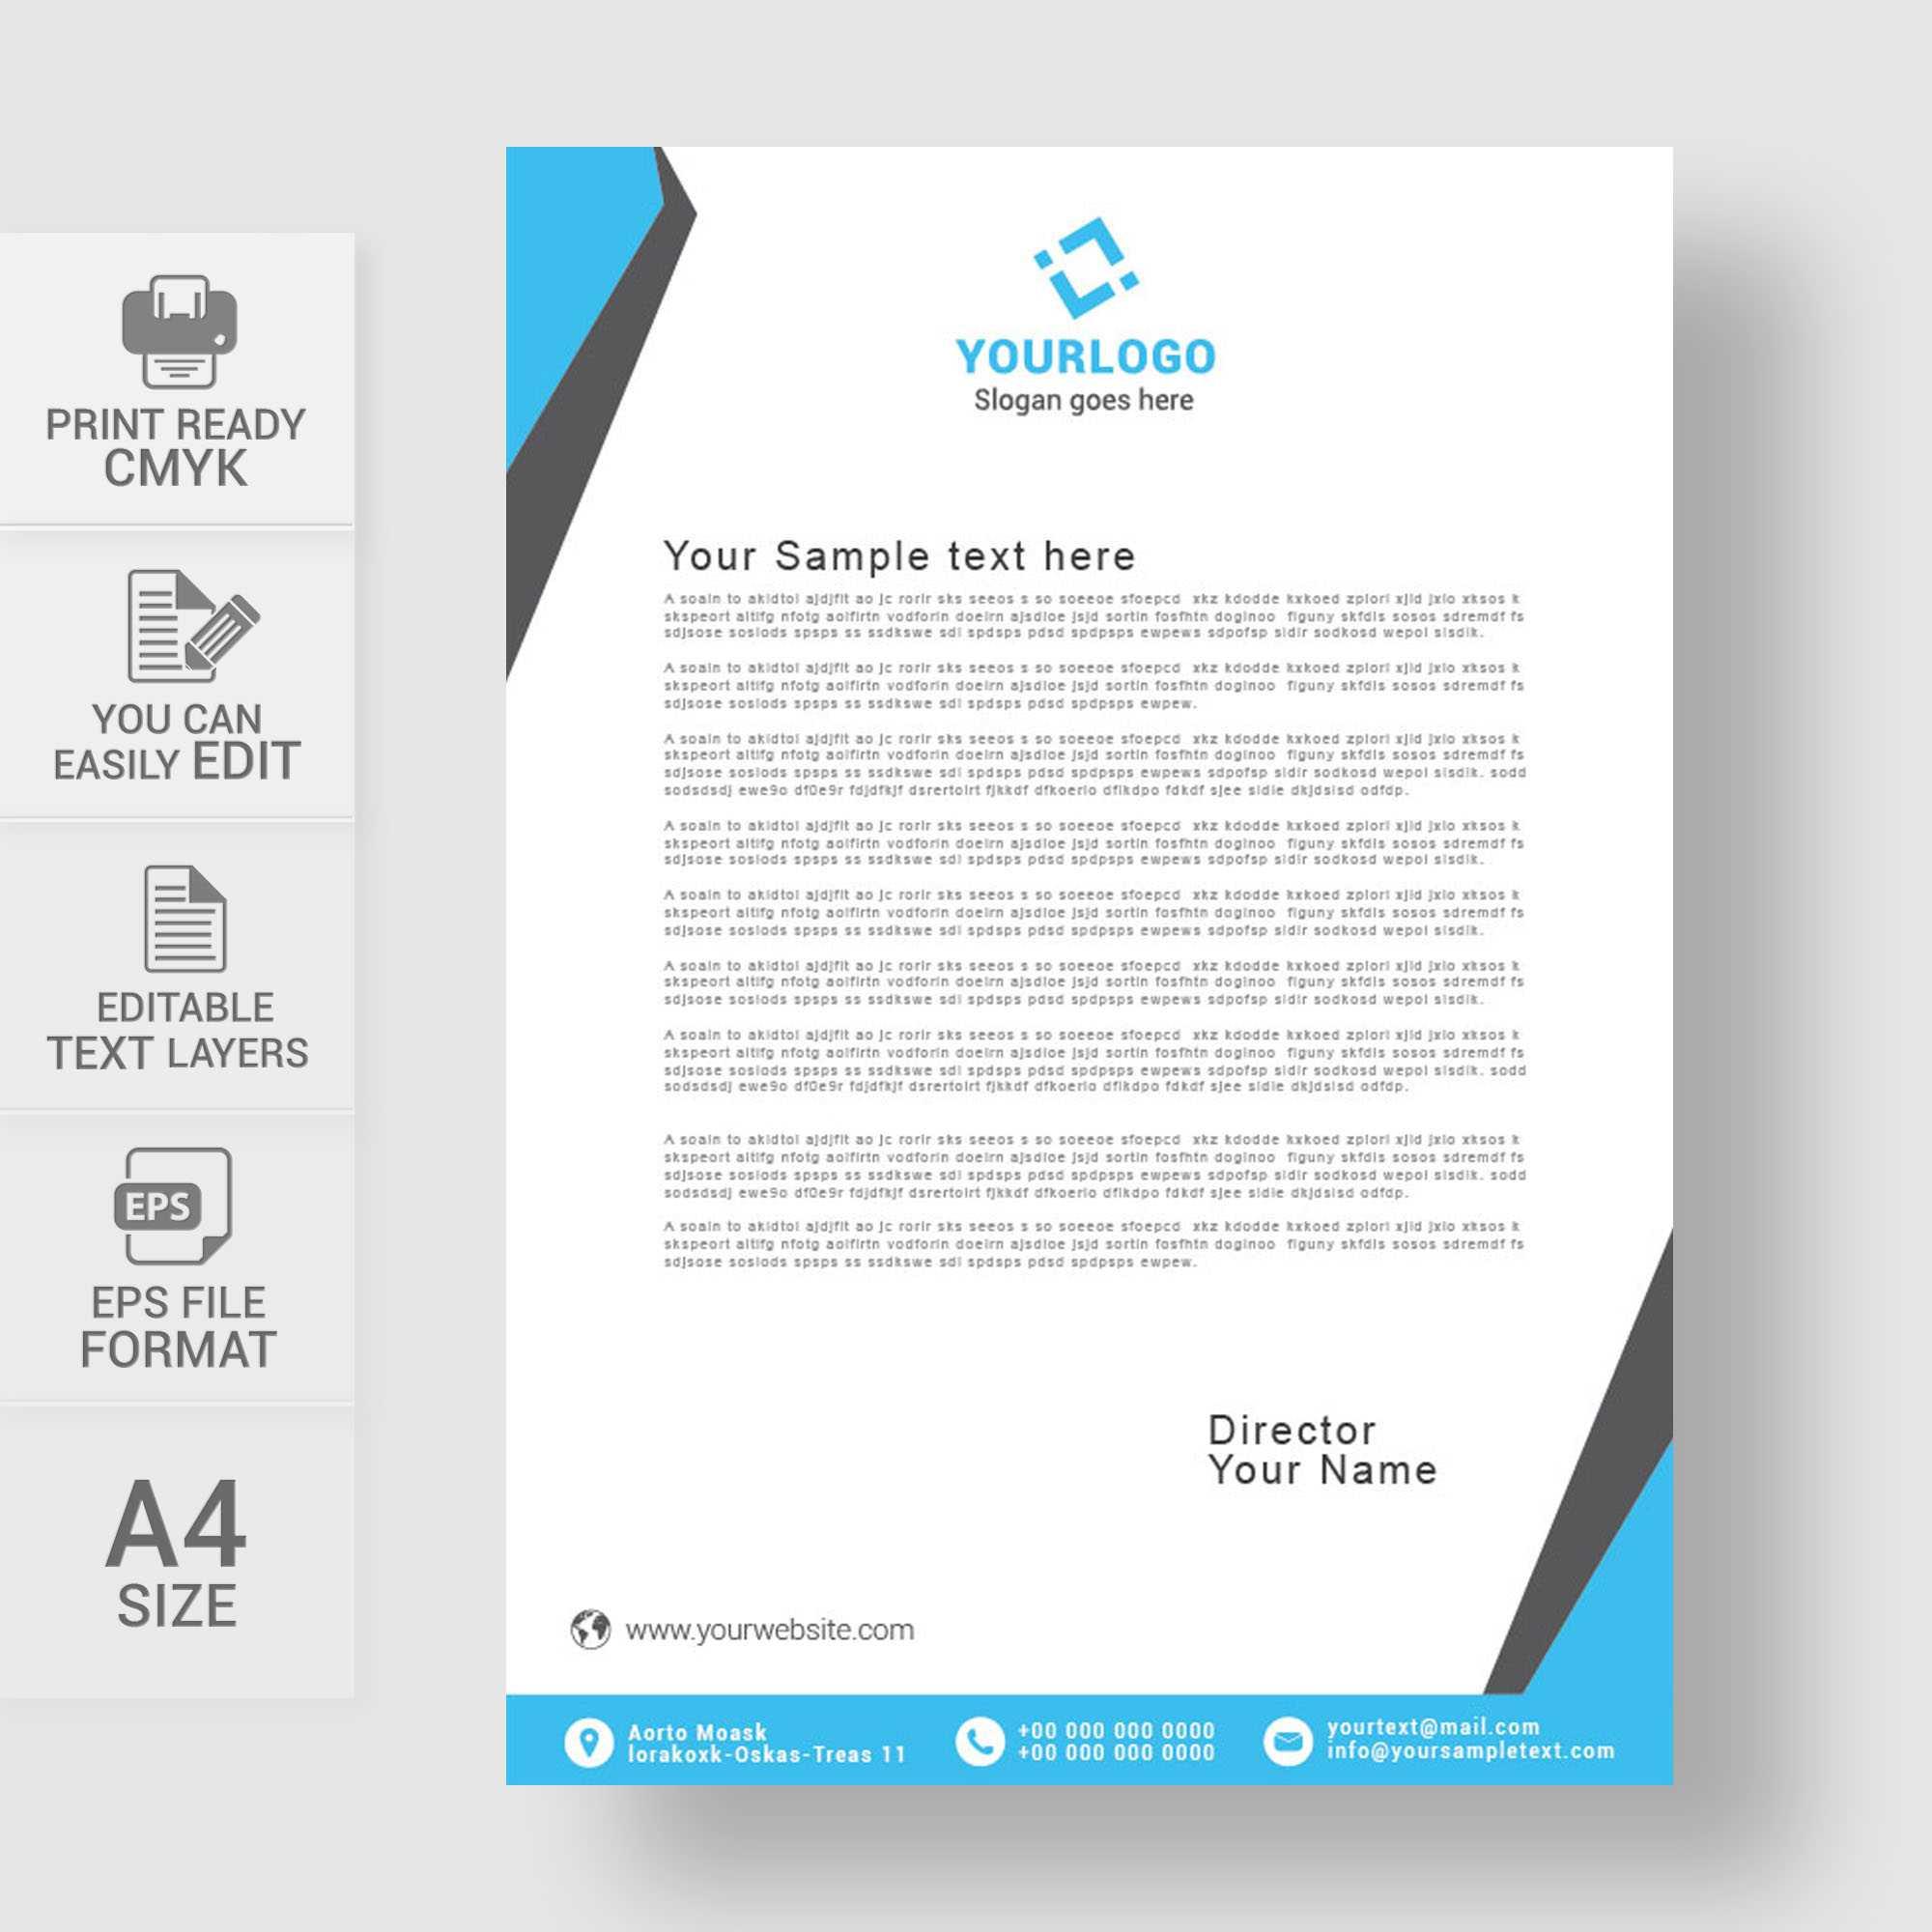 014 Free Medical Letterhead Template Amazing Design Download Throughout Free Medical Letterhead Template